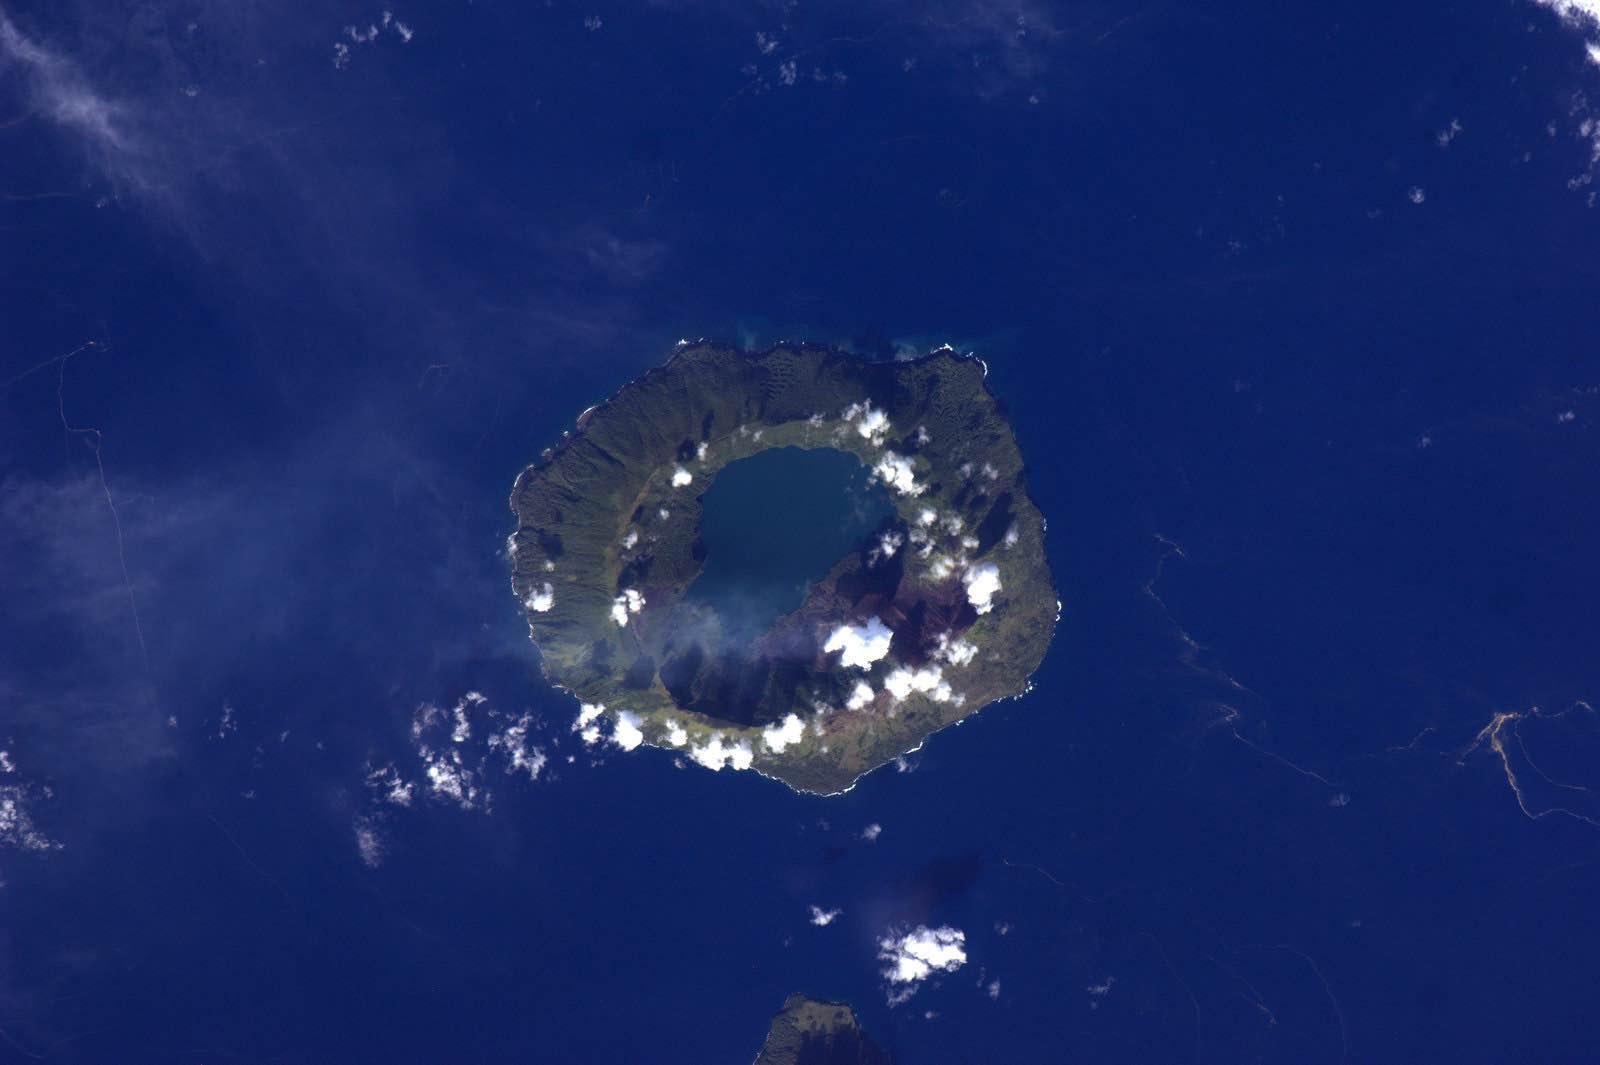 Tofua Island, Tonga. The Kingdom has a new island, Lateiki, following a recent volcanic eruption (Photo: NASA)